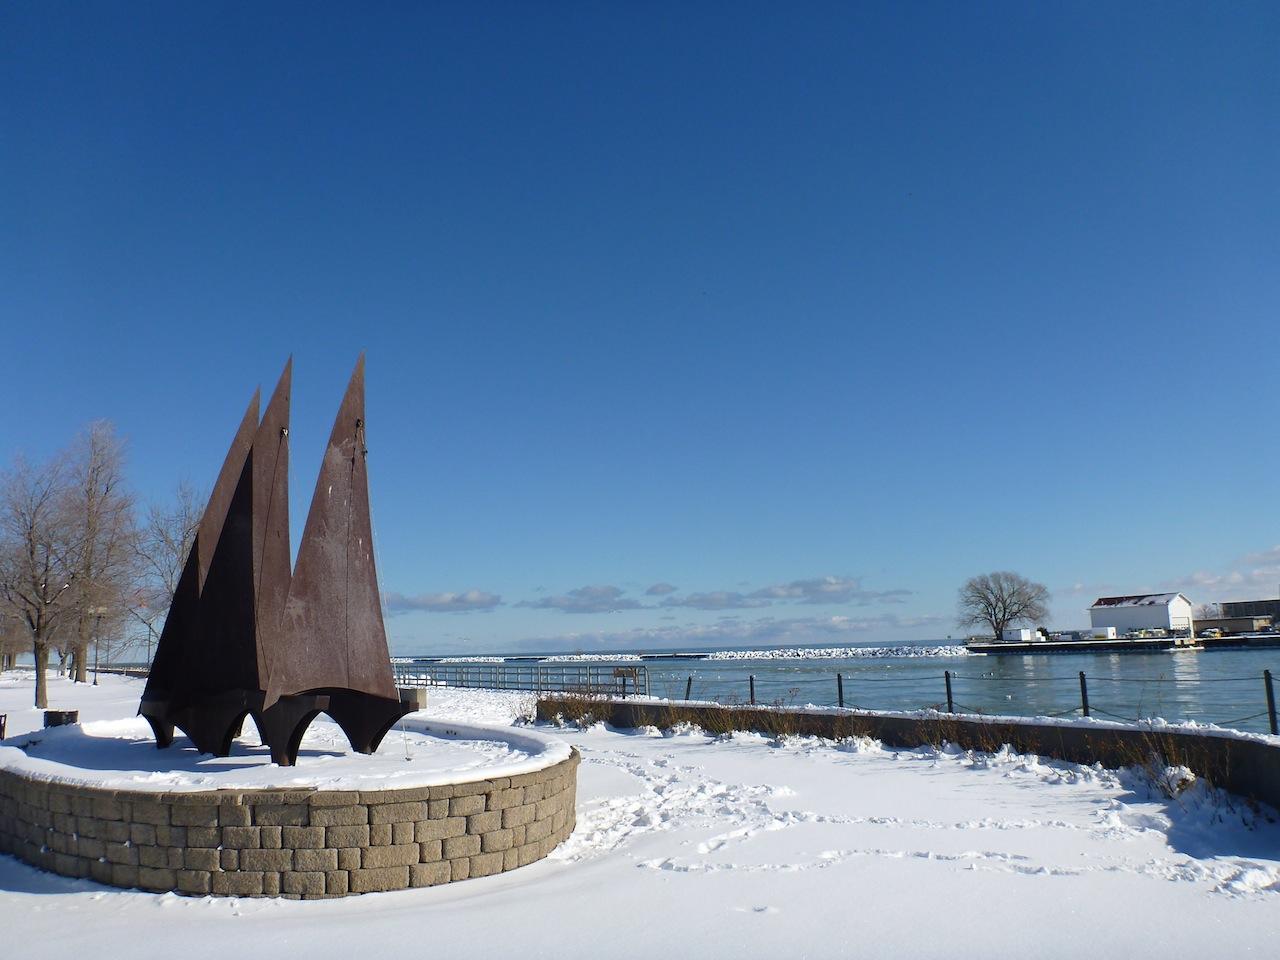 A Nice Sculpture At Charlotte Beach Park, NY